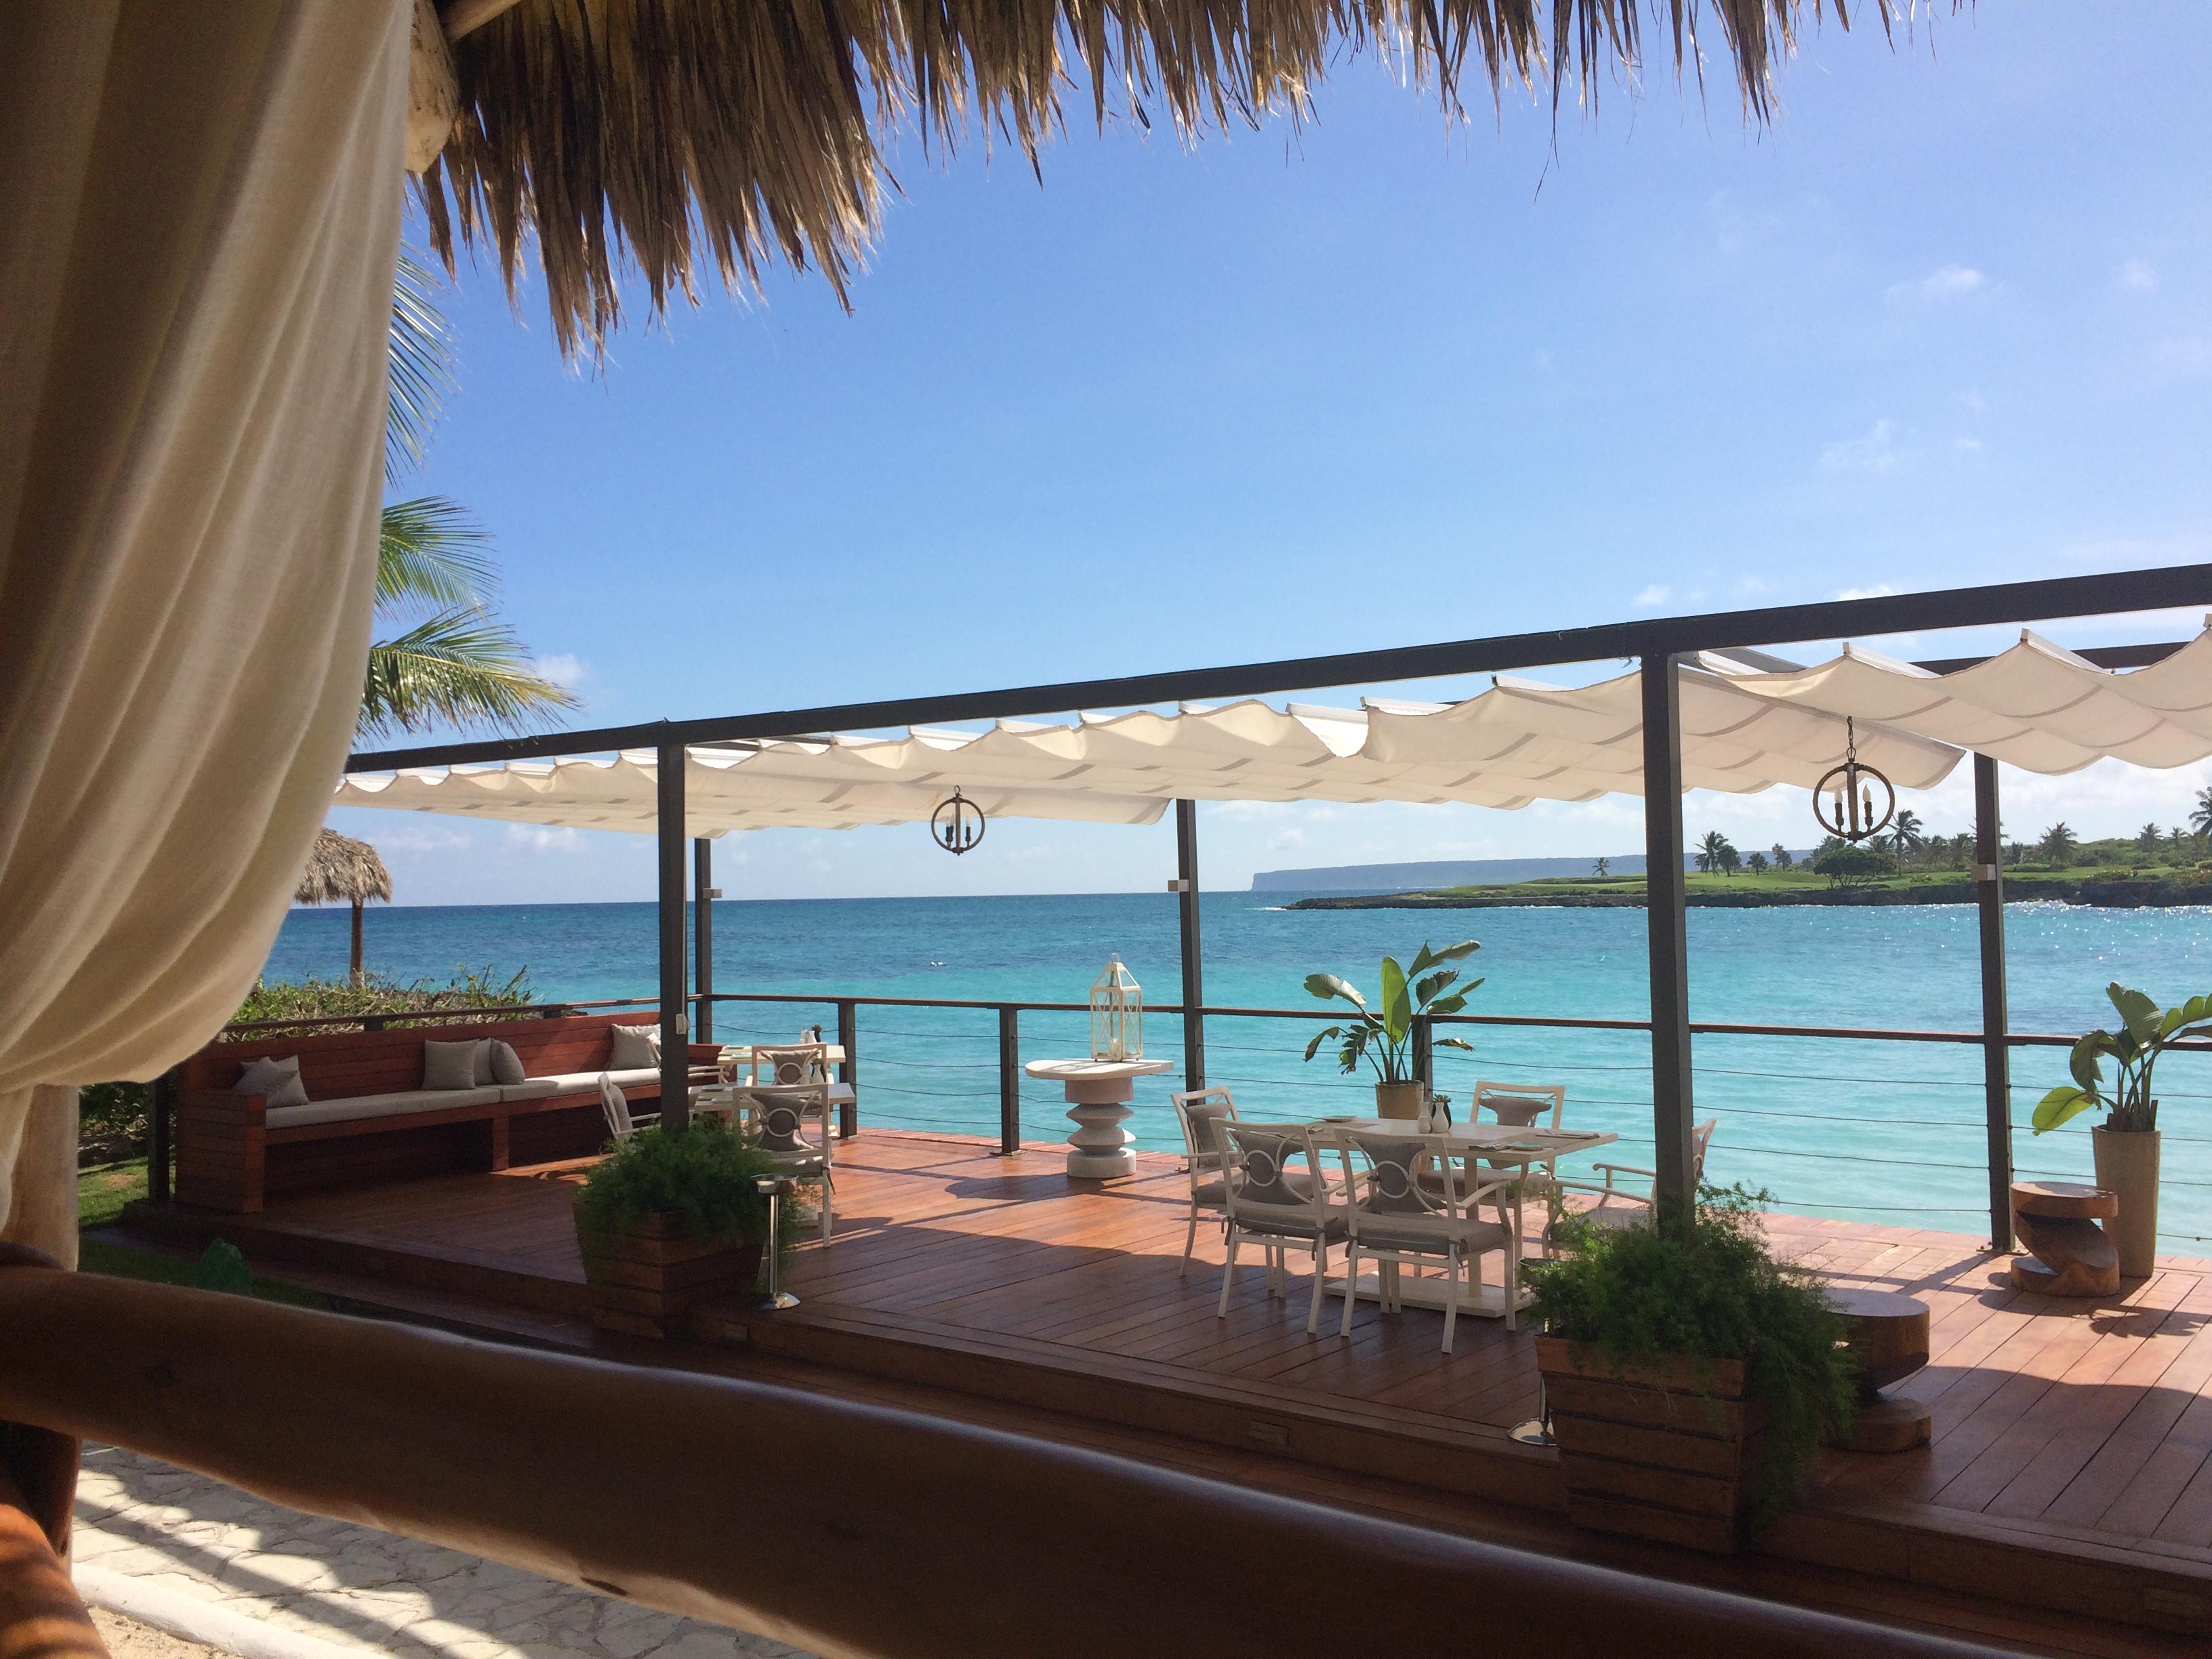 La Palapa Restaurant, Caleton Beach Club